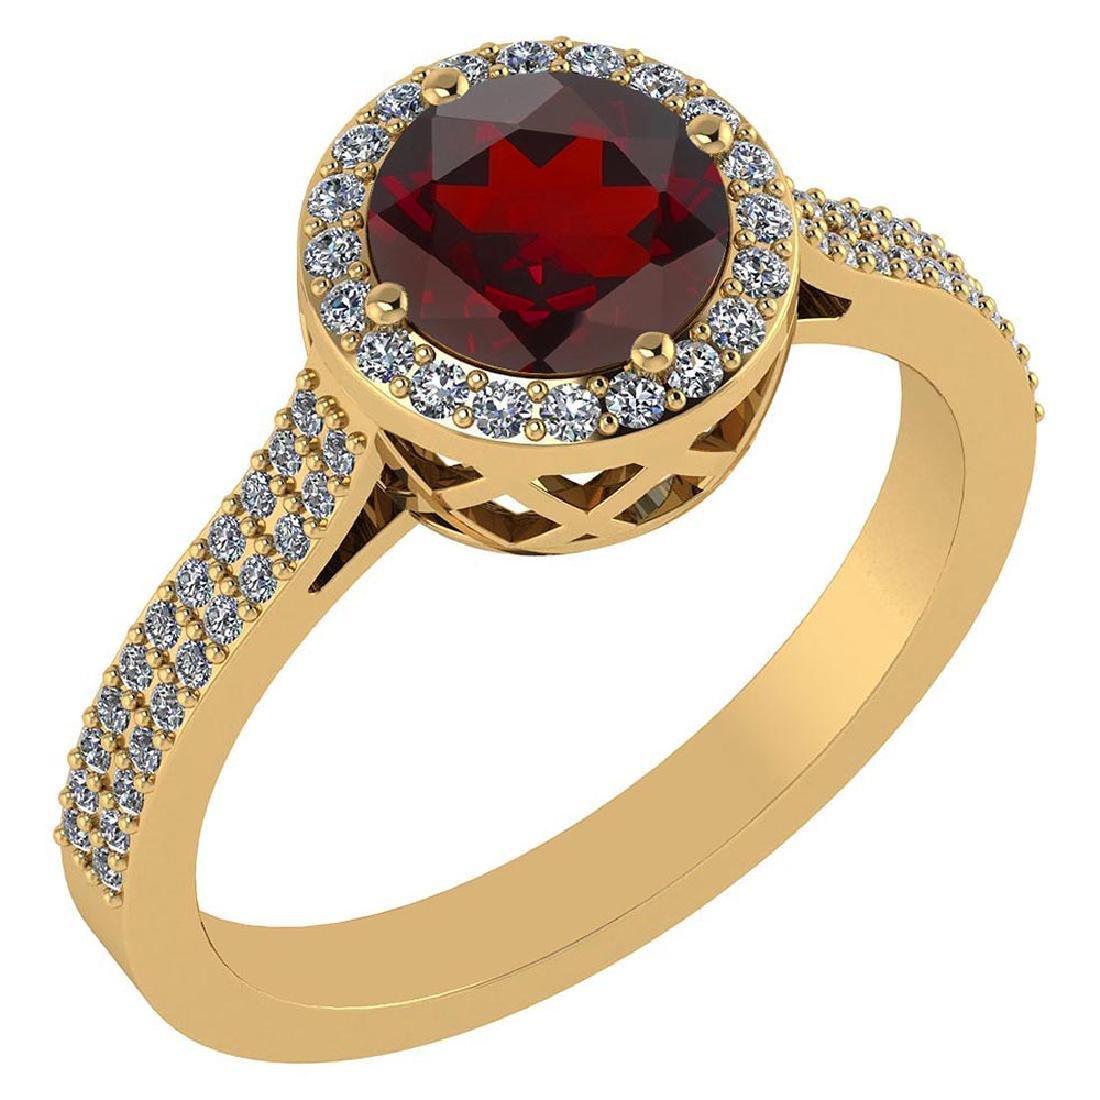 1.77 Ctw Garnet And Diamond 14k Yellow Gold Halo Ring